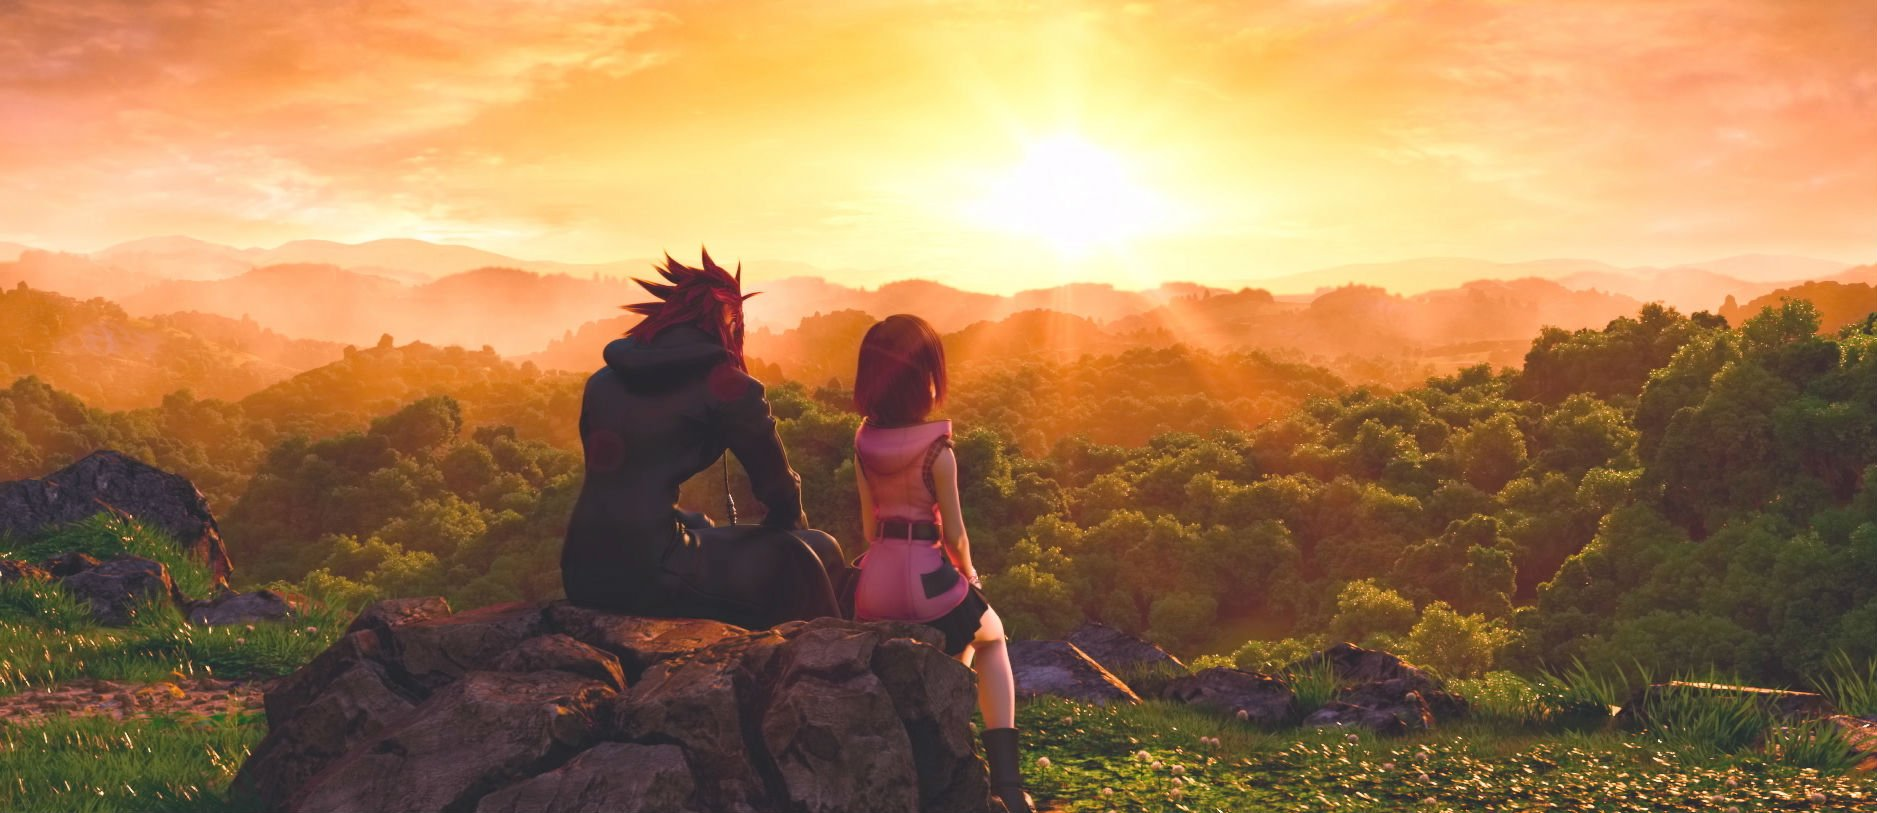 Kingdom Hearts III review